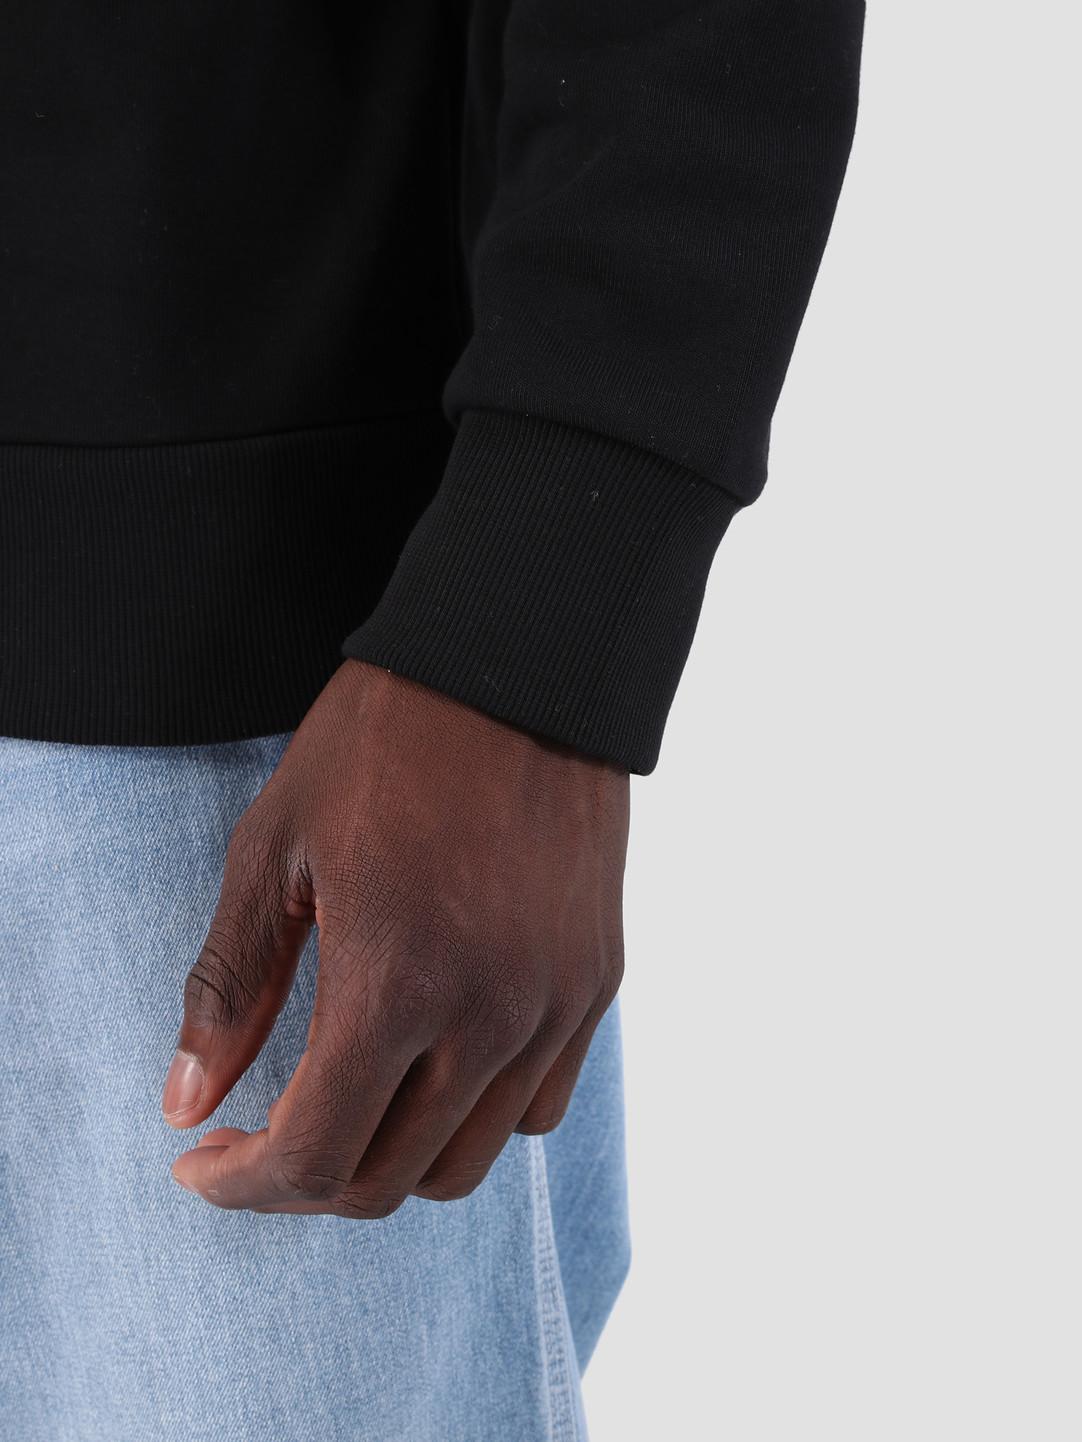 Carhartt WIP Carhartt WIP State Patch Sweat Black I026347